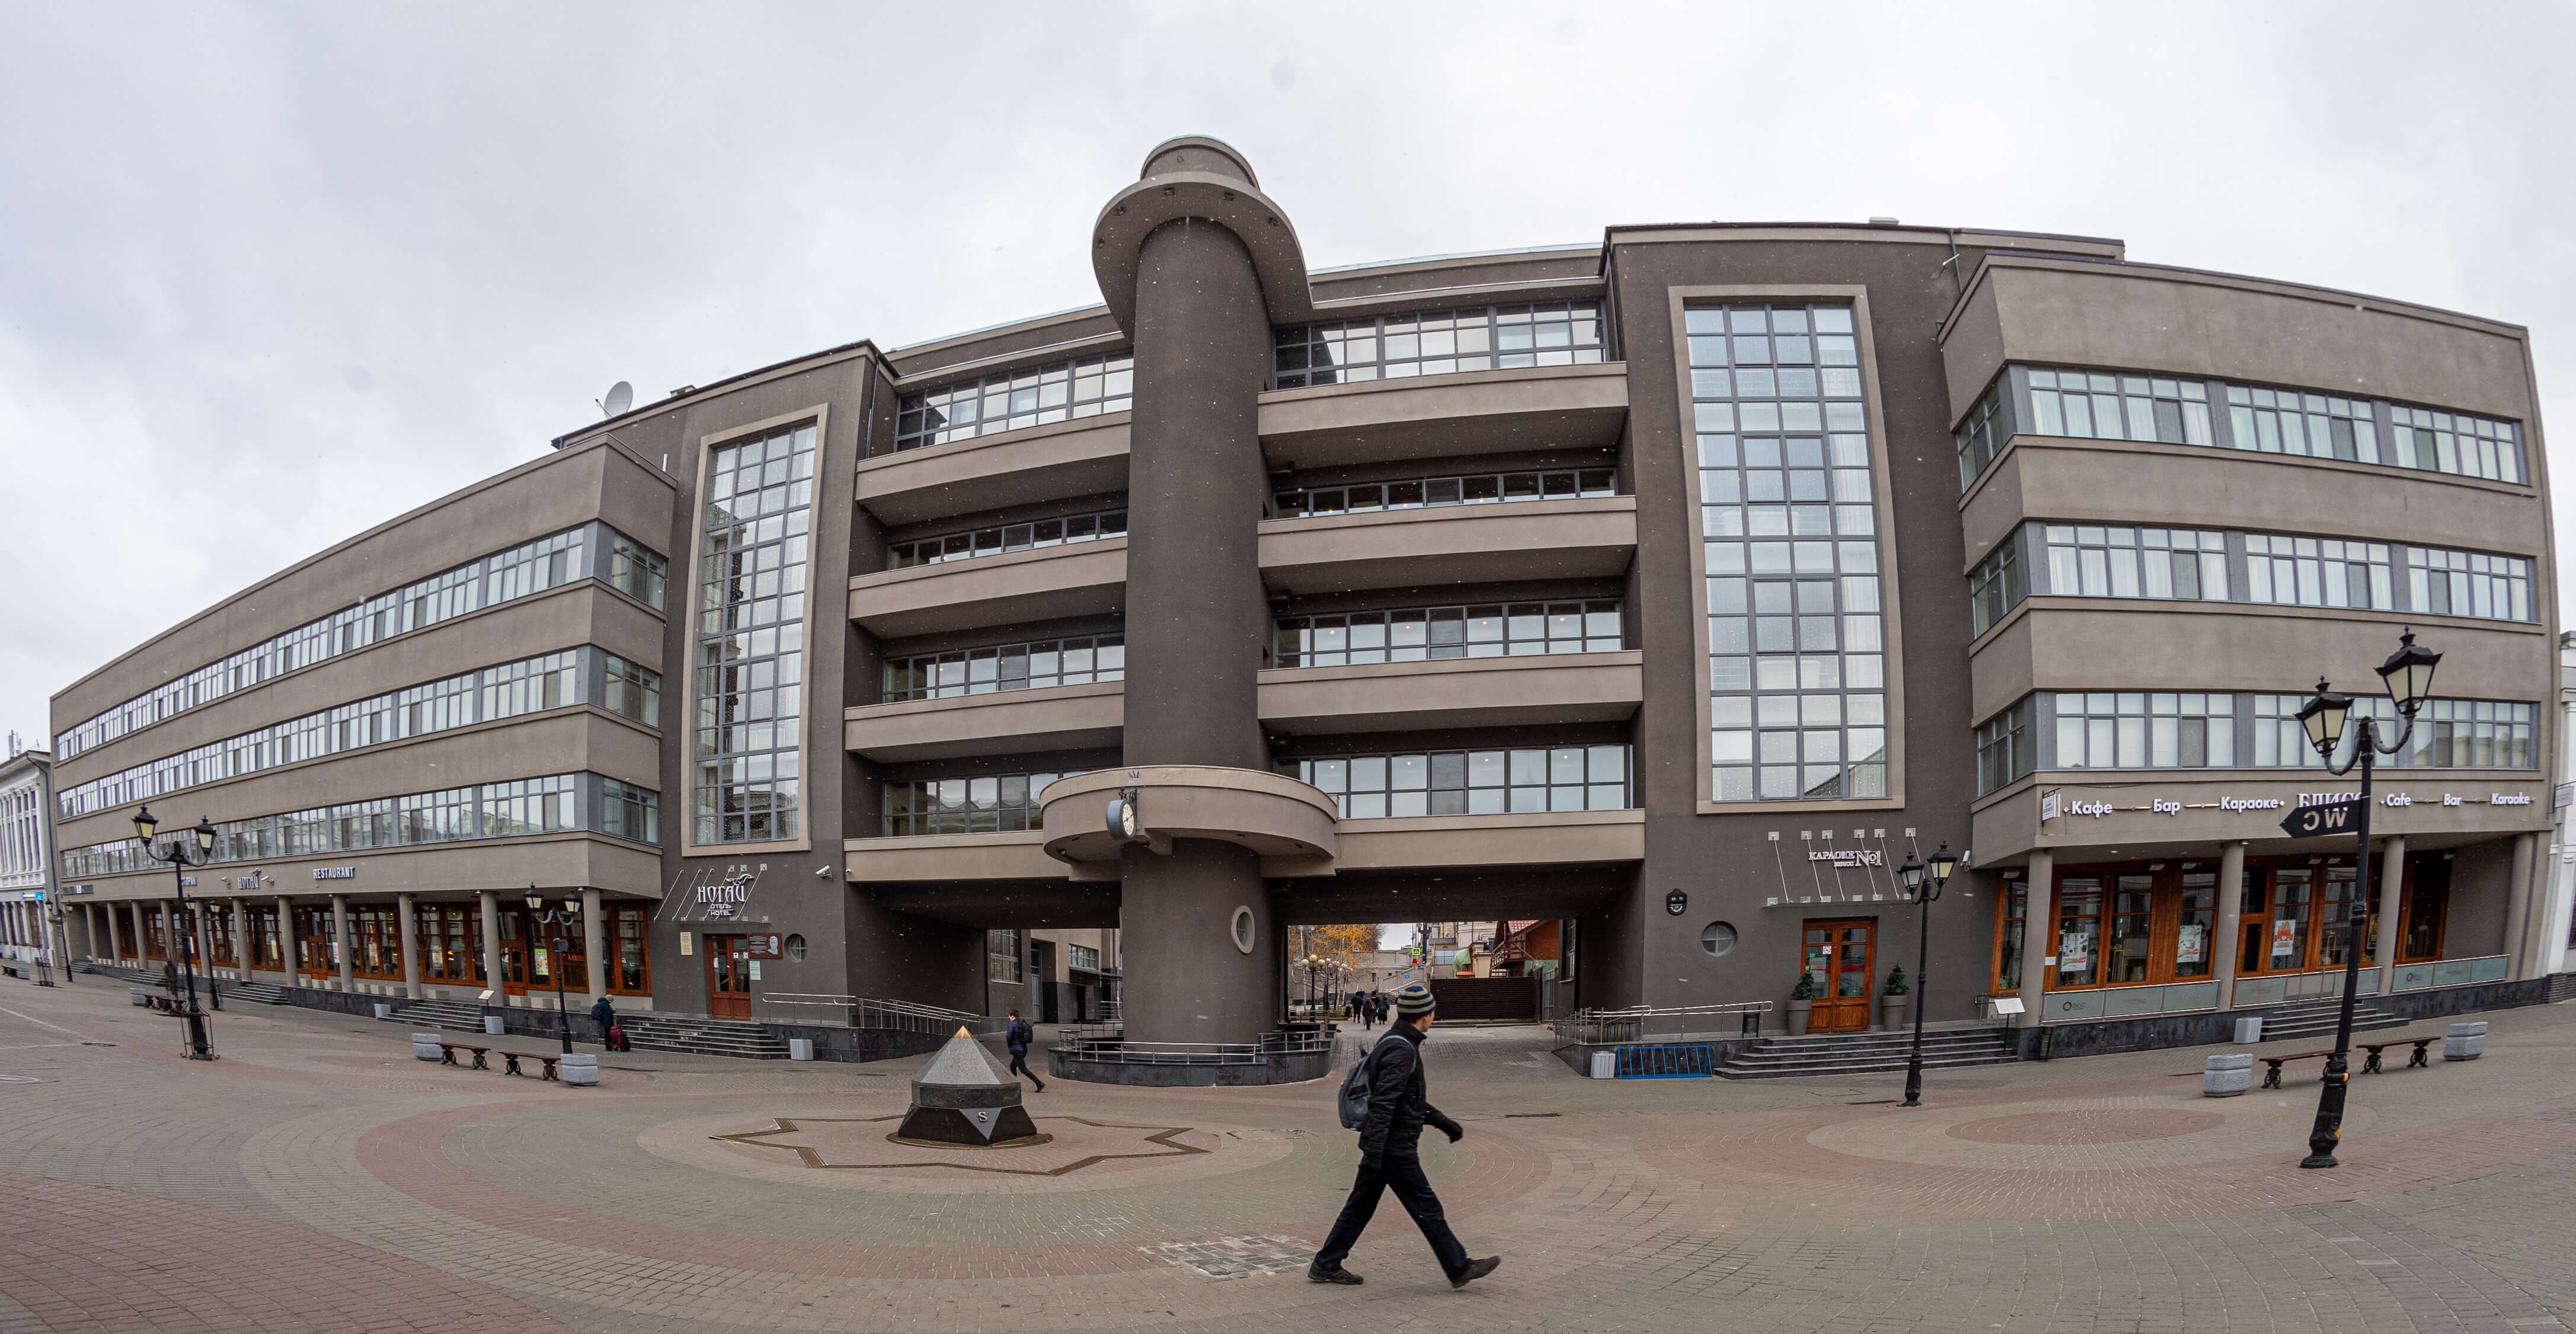 Беларусь: силовикам и сотрудникам СМИ при необходимости дадут телохранителя